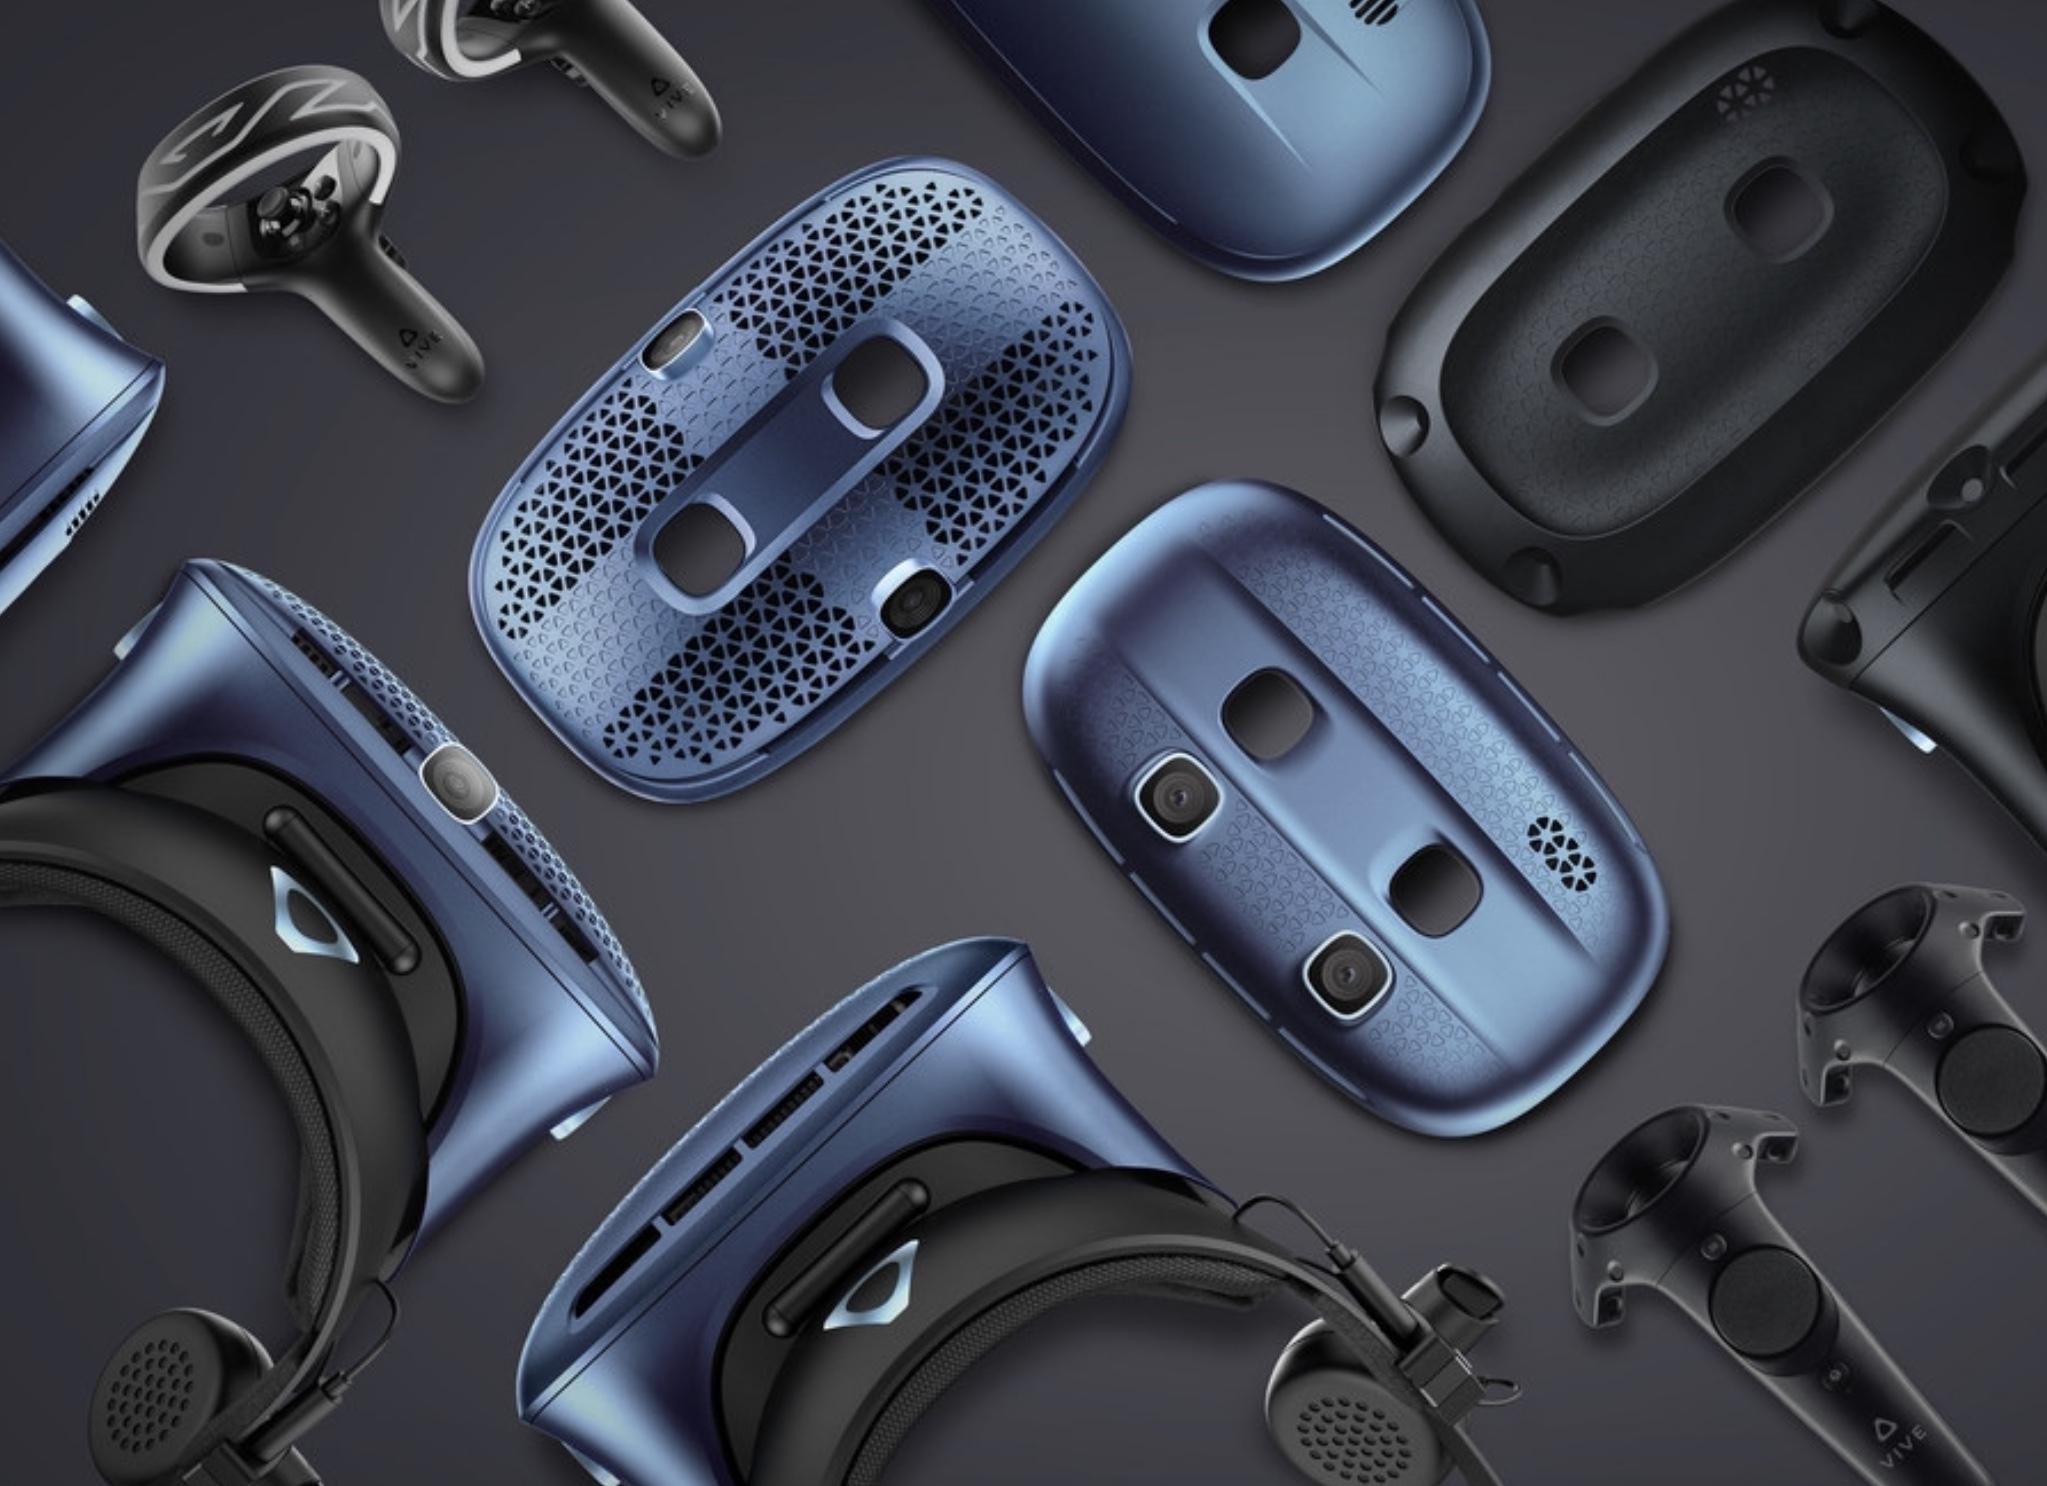 HTC Vice Cosmos